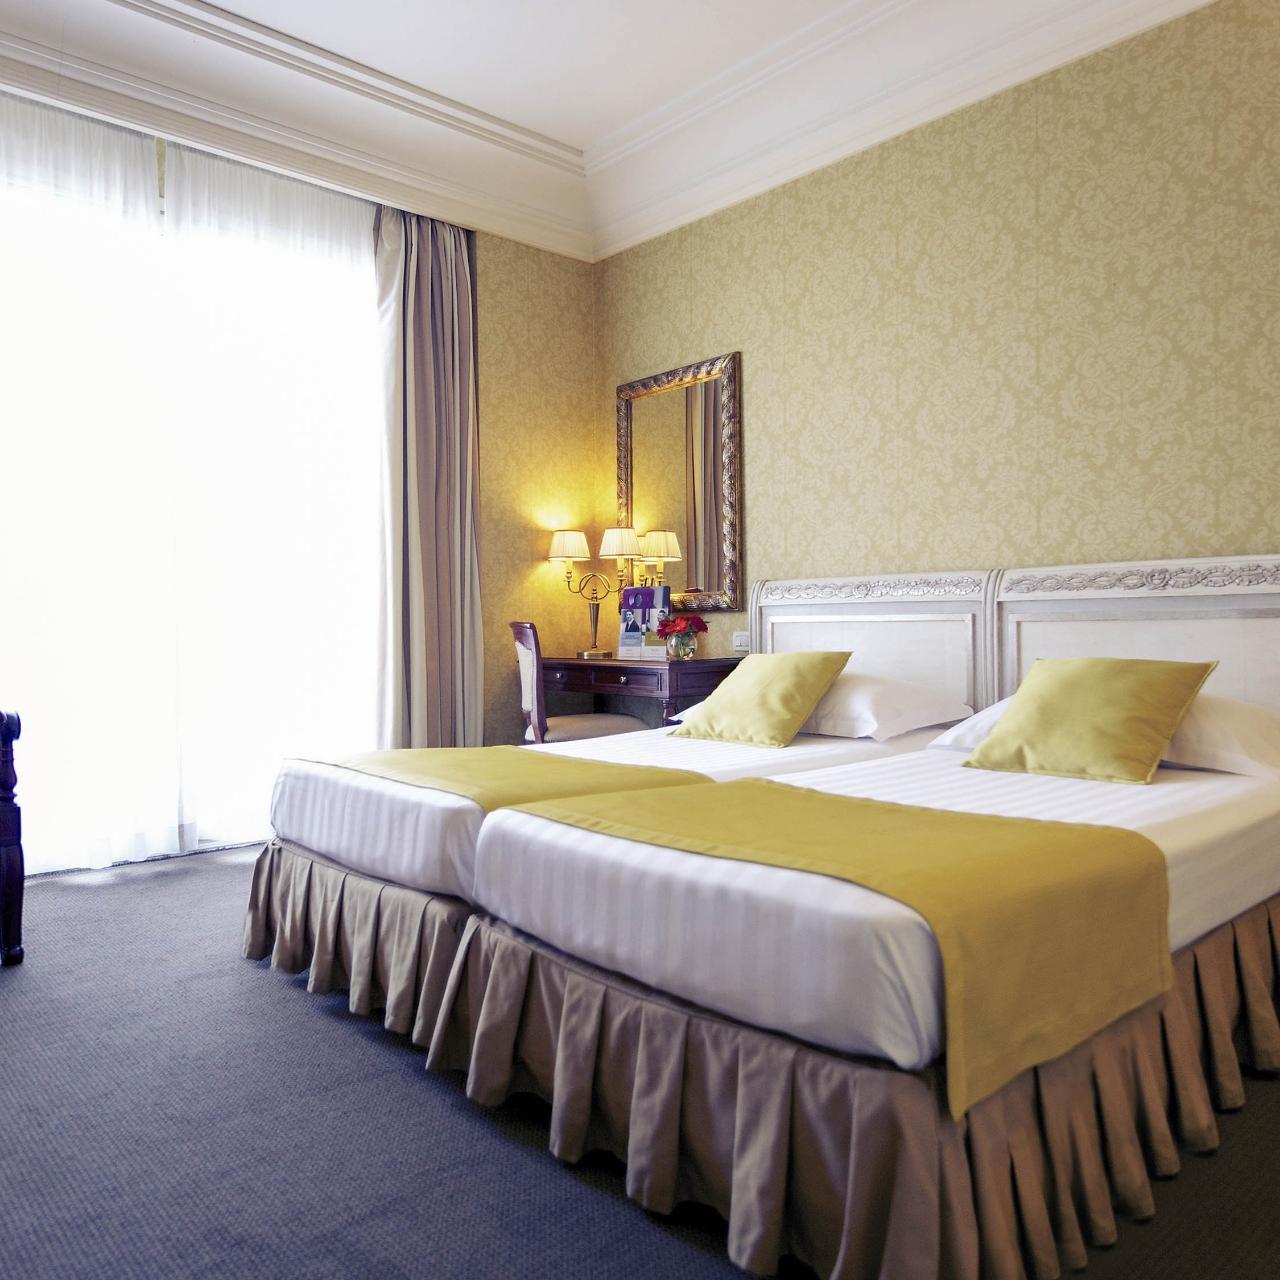 Hotel Mercure Catania Excelsior Italien Bei Hrs Mit Gratis Leistungen